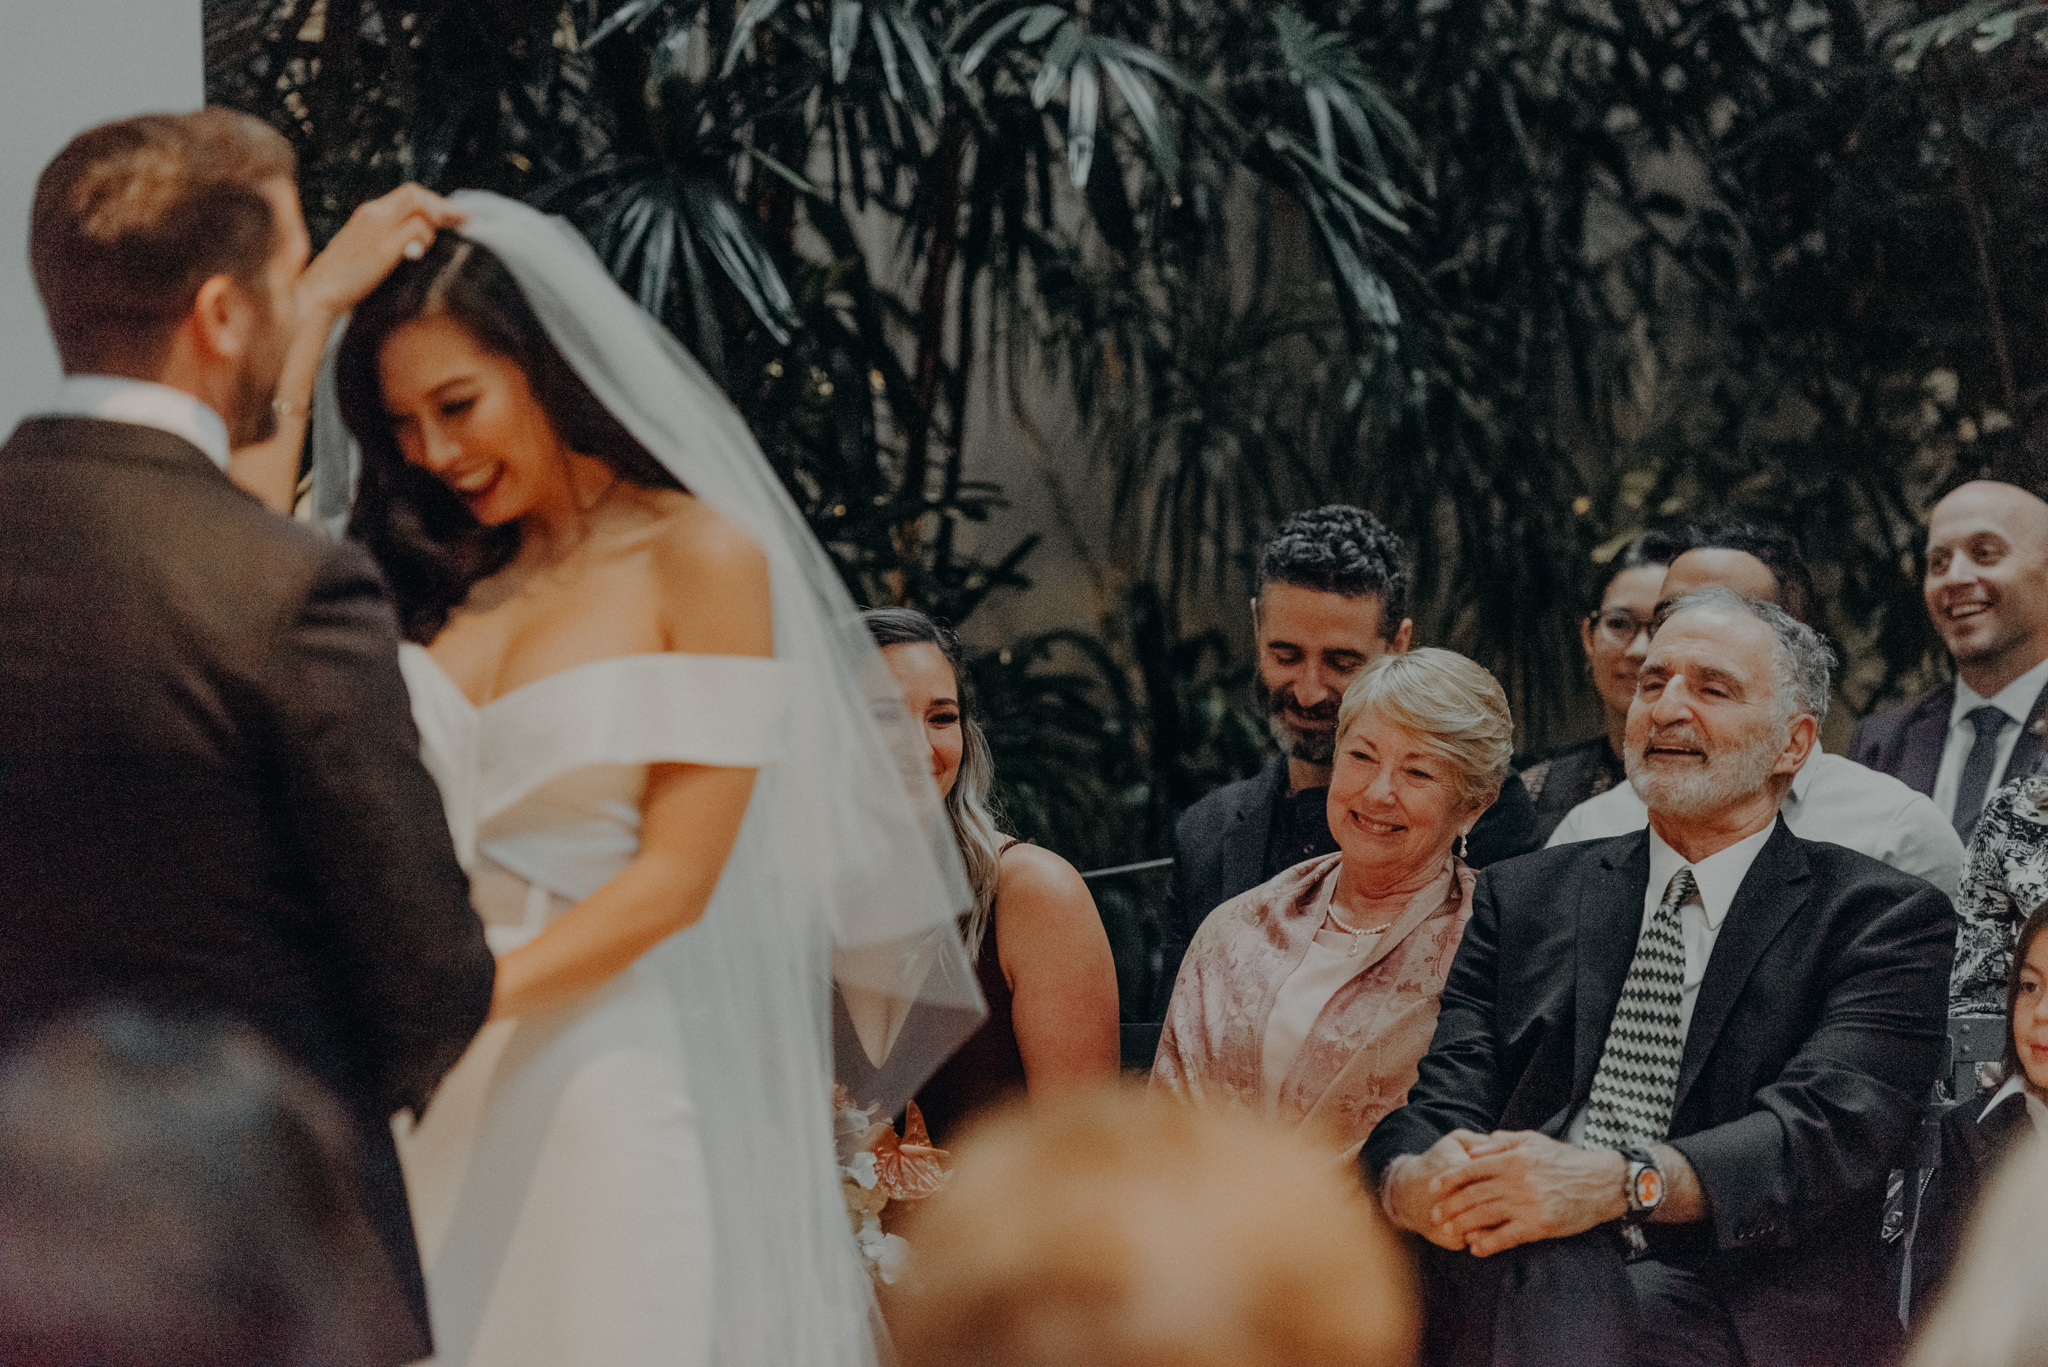 Wedding Photo LA - wedding photographer in los angeles - millwick wedding venue -isaiahandtaylor.com-095.jpg